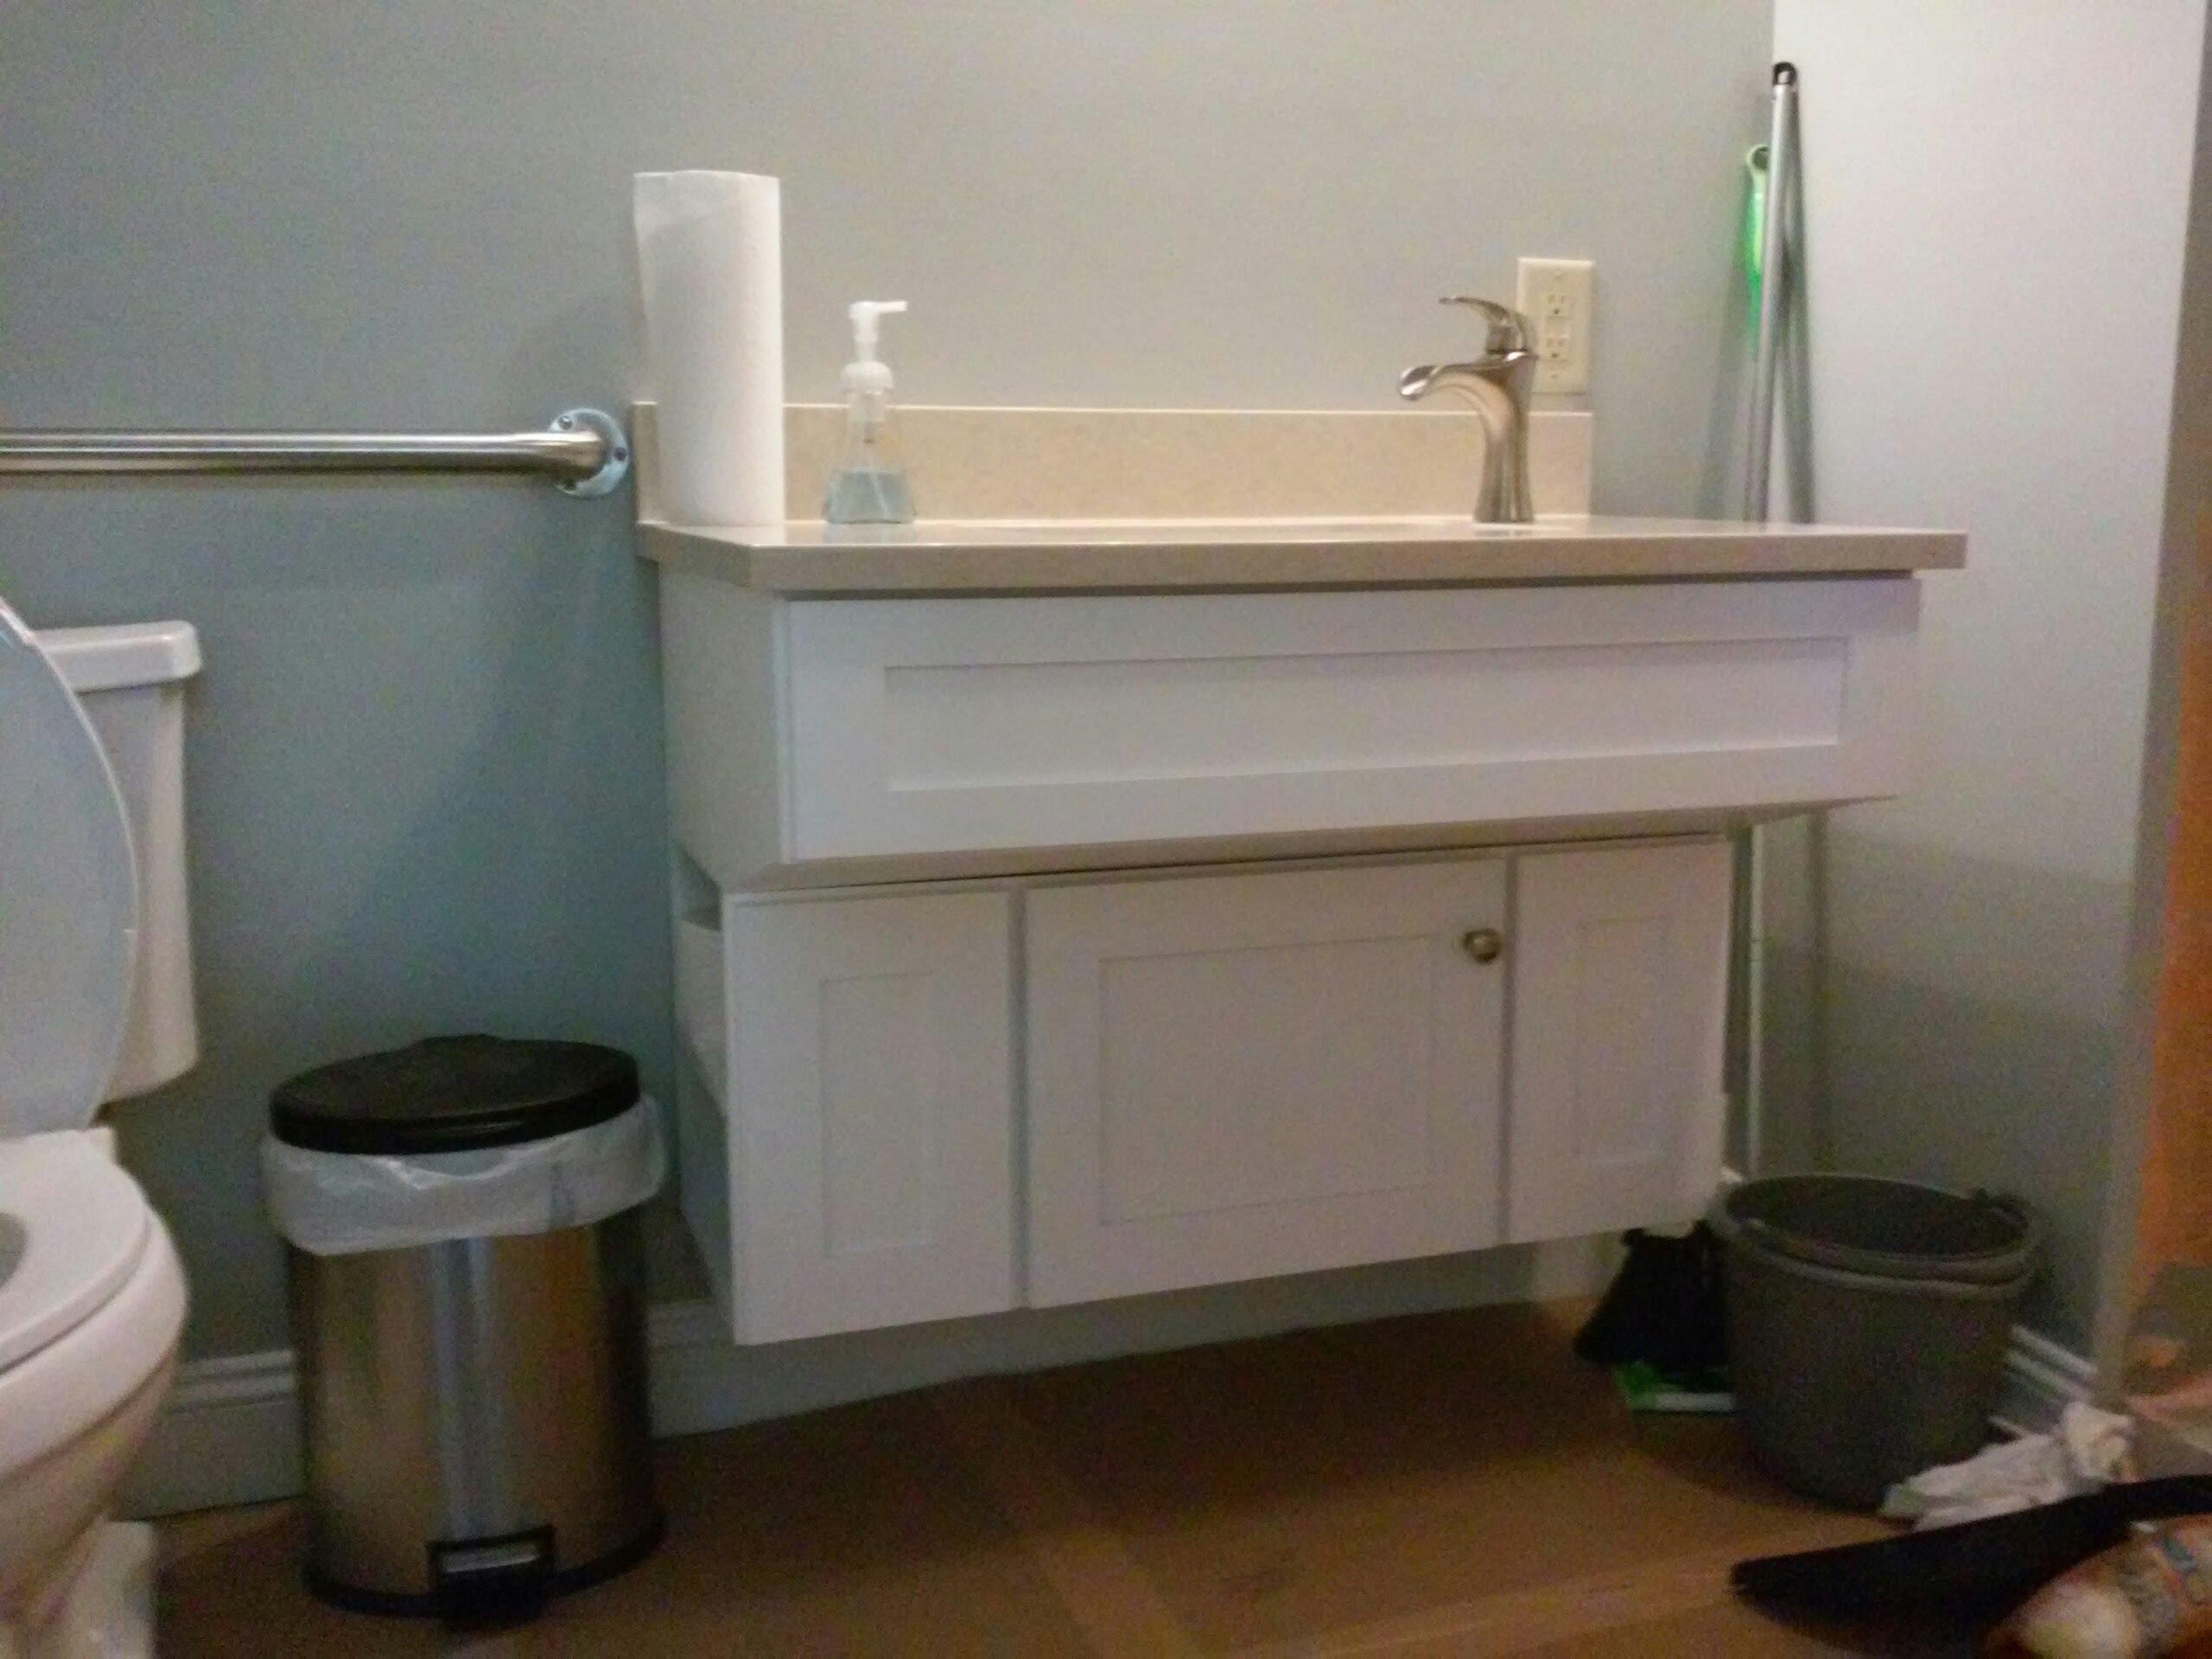 Ada bathroom guidelines